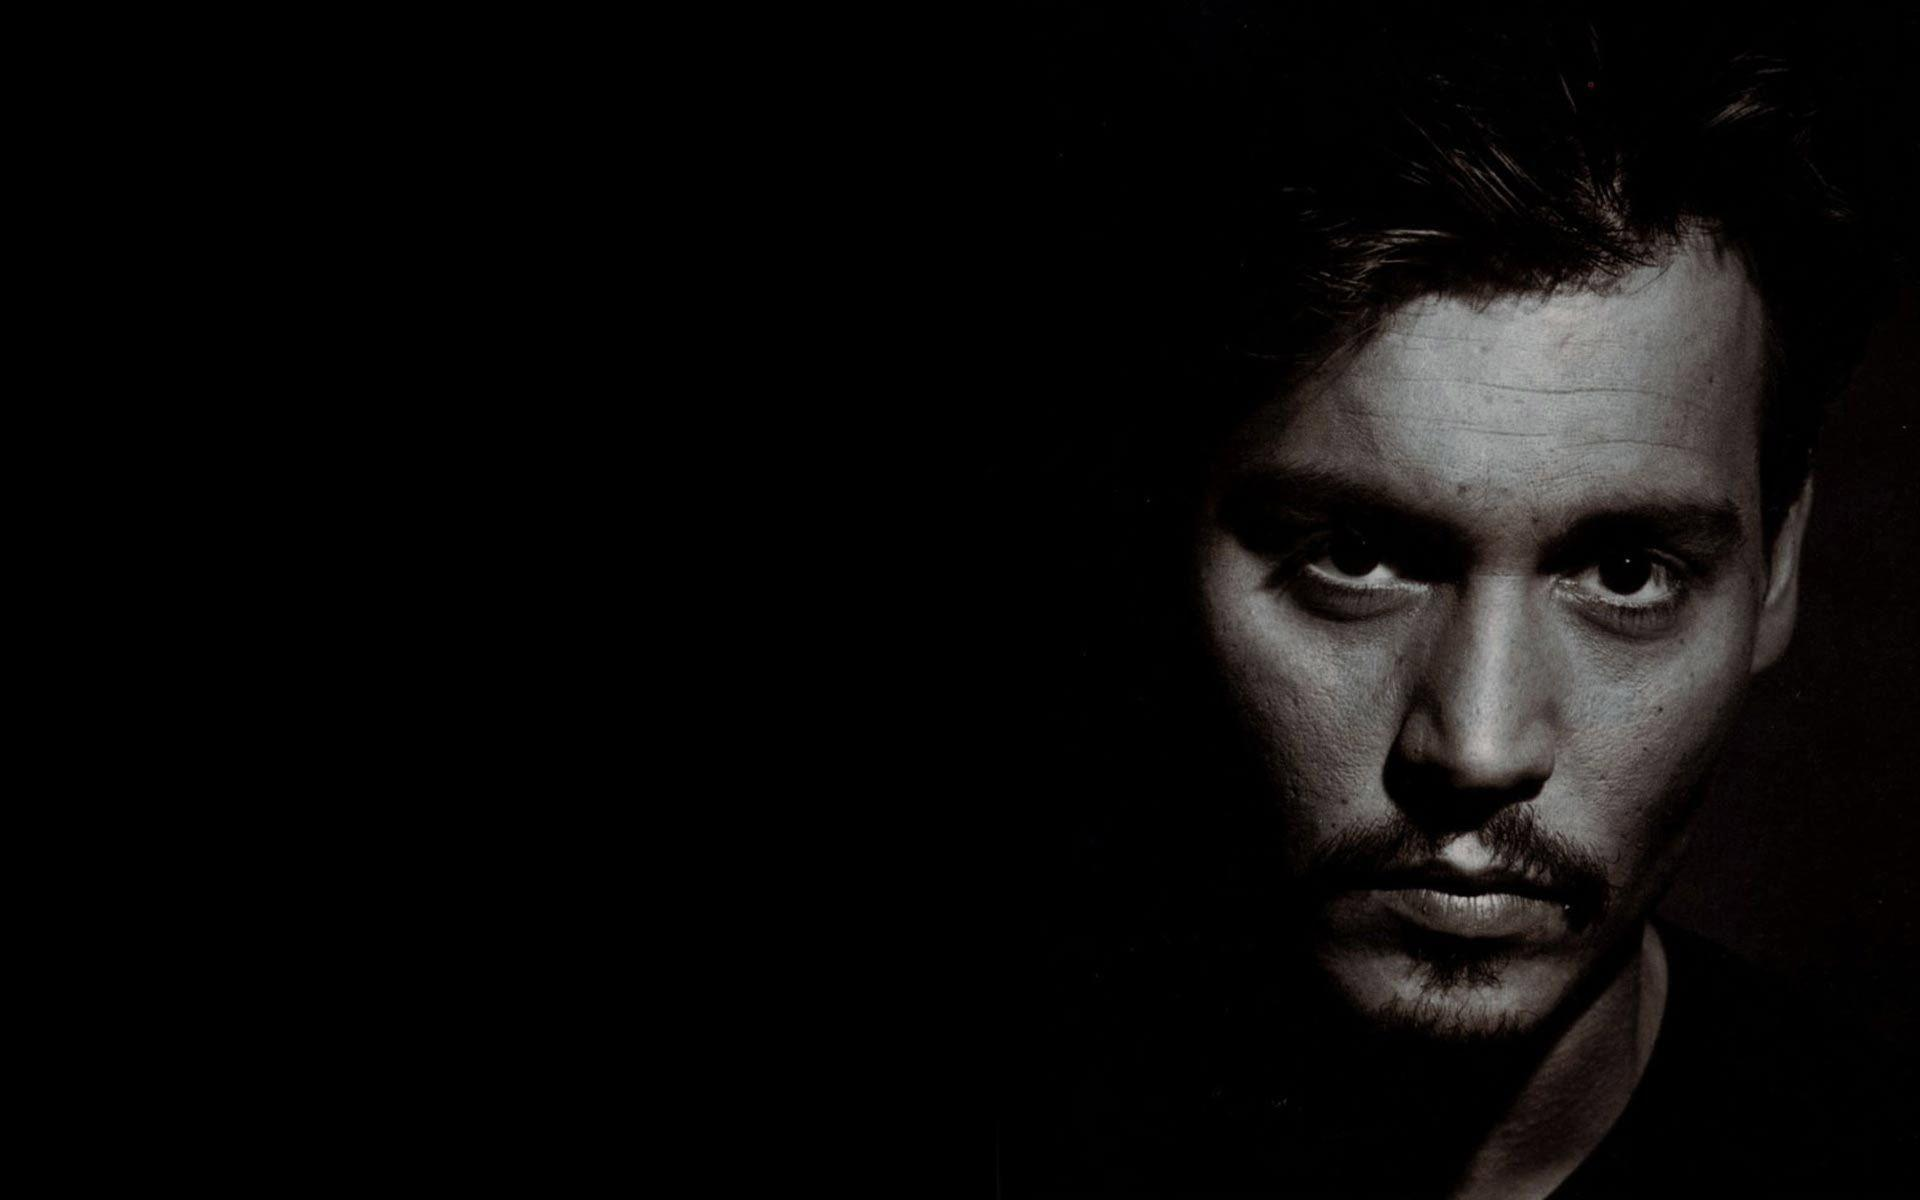 Johnny Depp Wallpapers 1920x1200